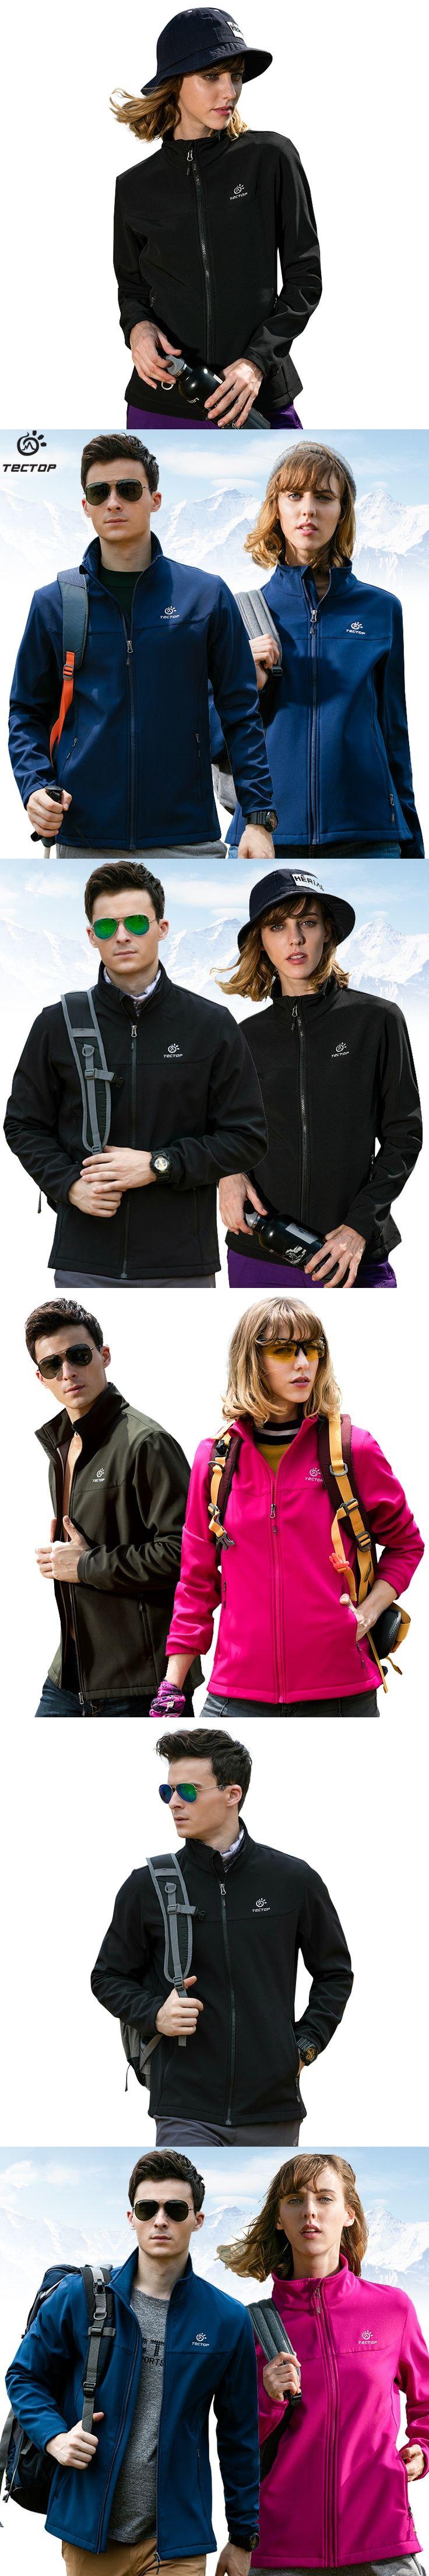 2017 men's outdoor military waterproof jacket sport thermal fleece clothing female hiking warm softshell jacket women breathable